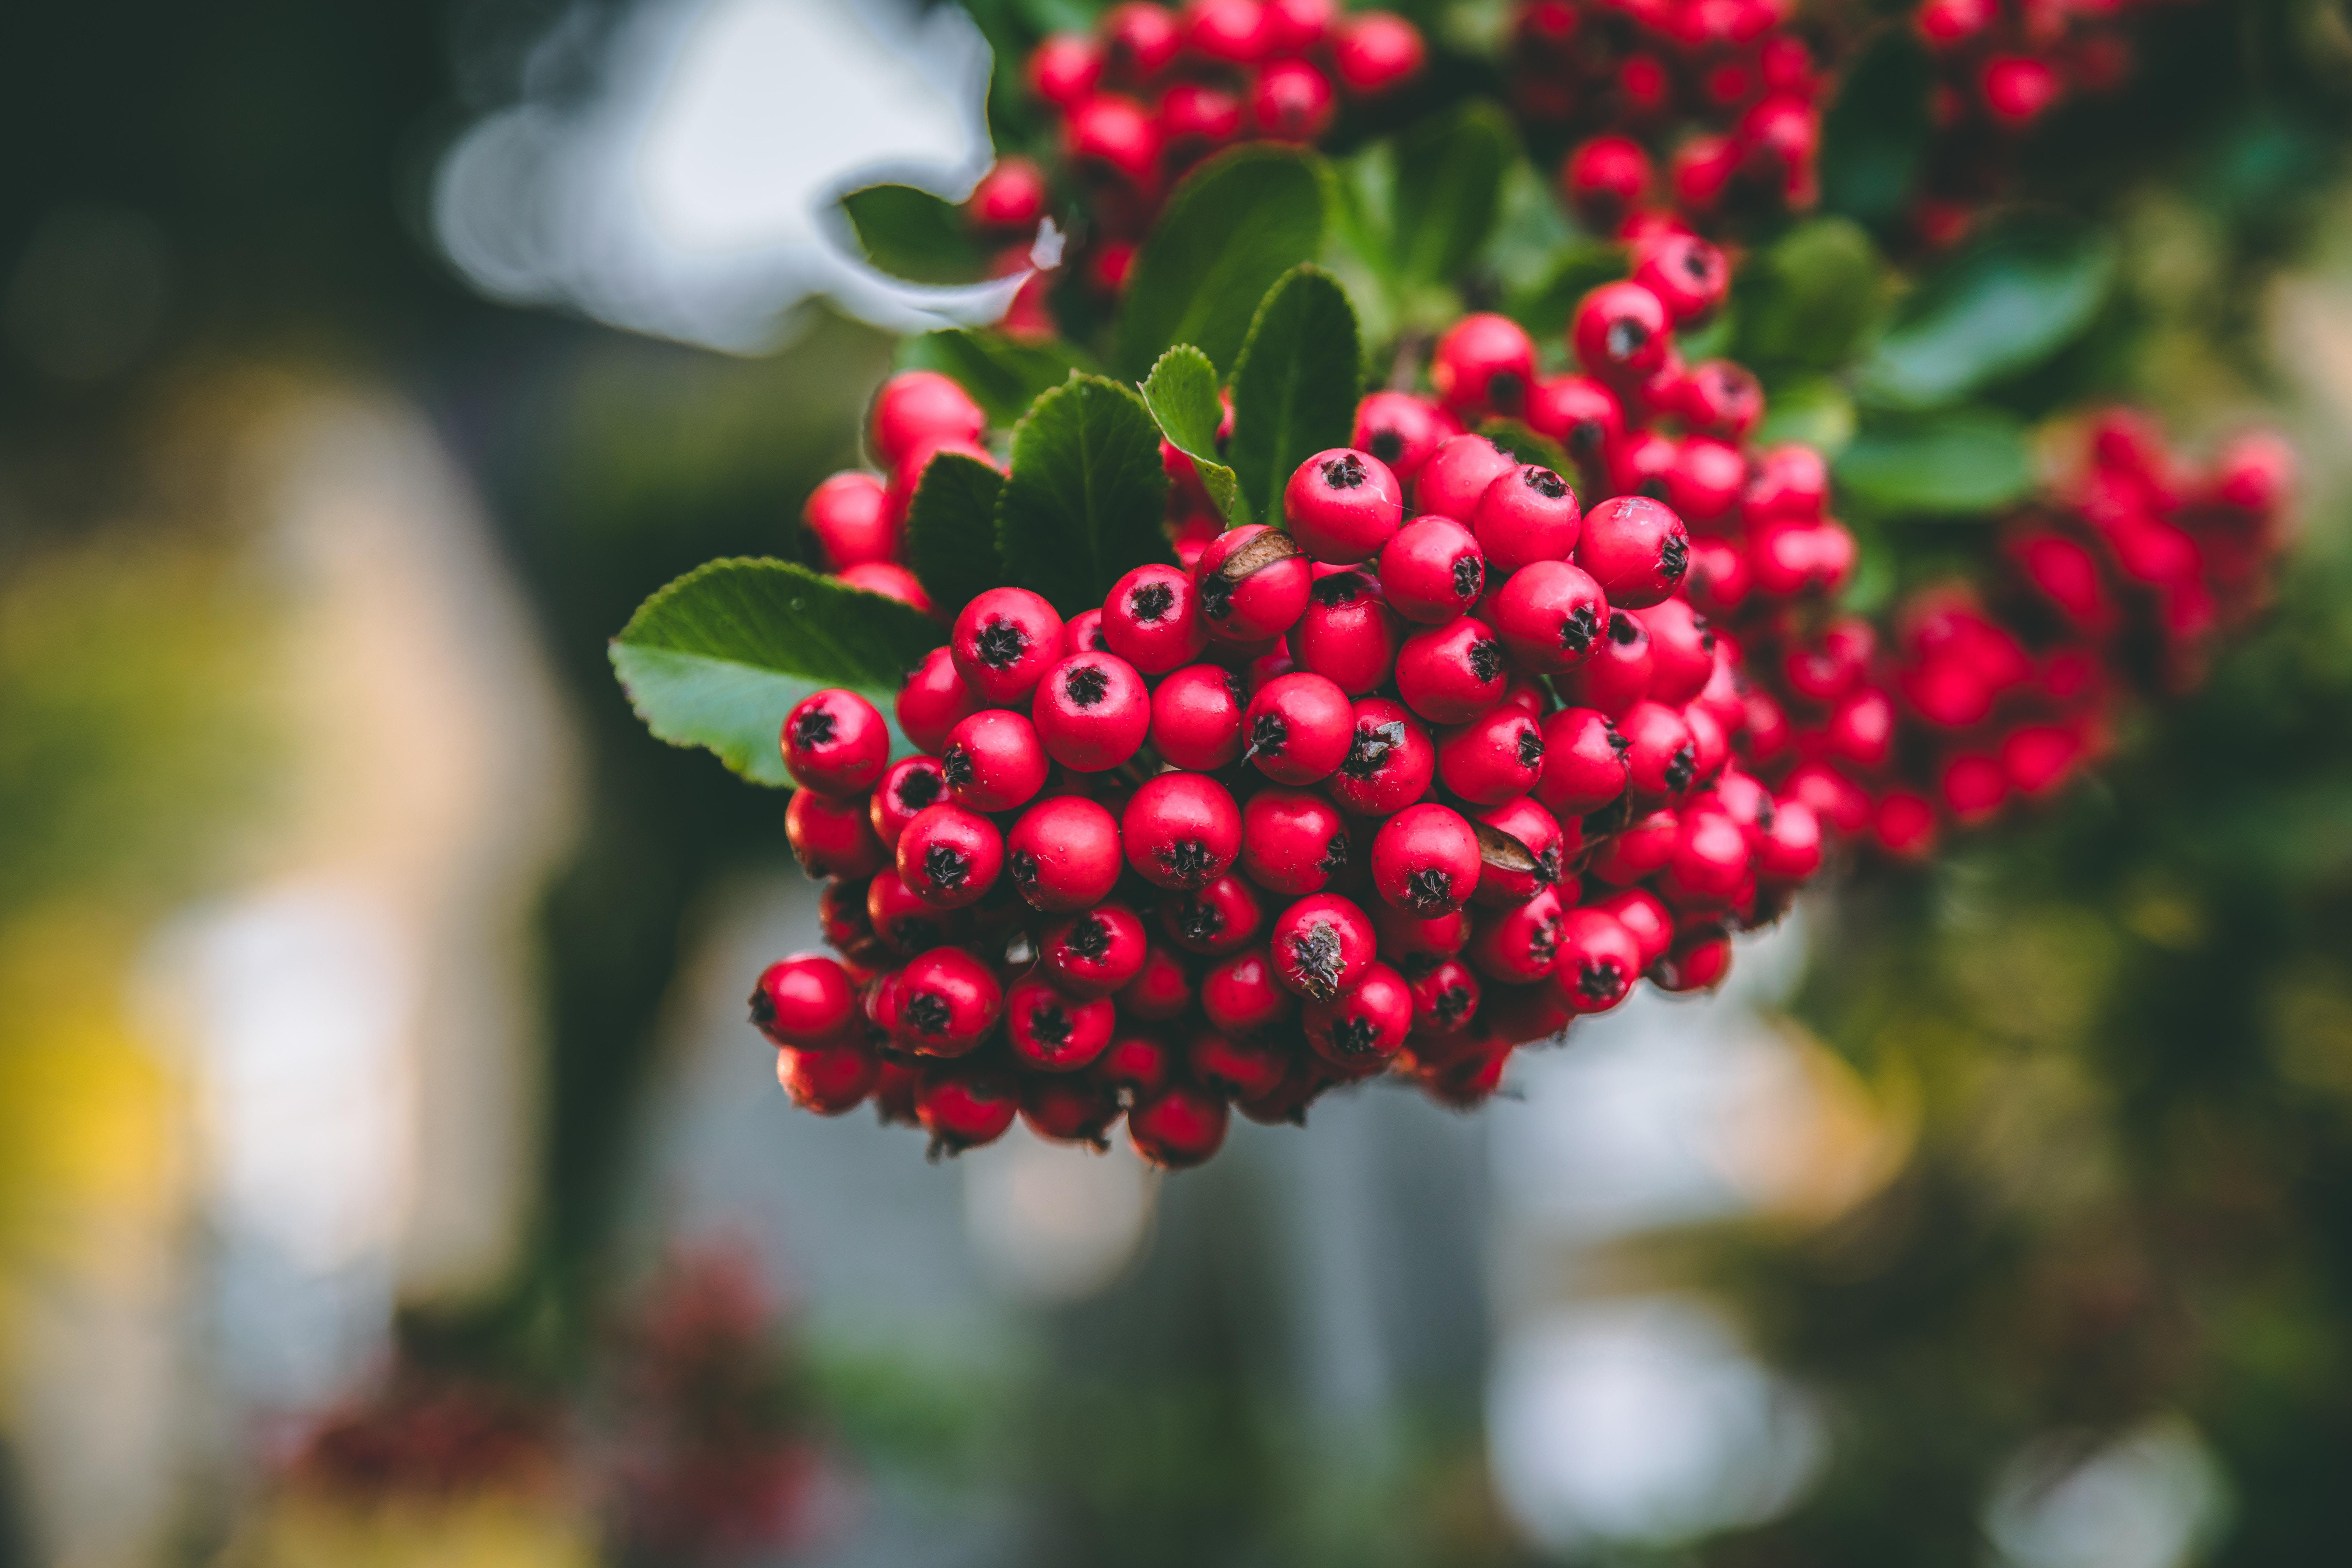 hawthorn, hawthorn fruit, hawthorn berry